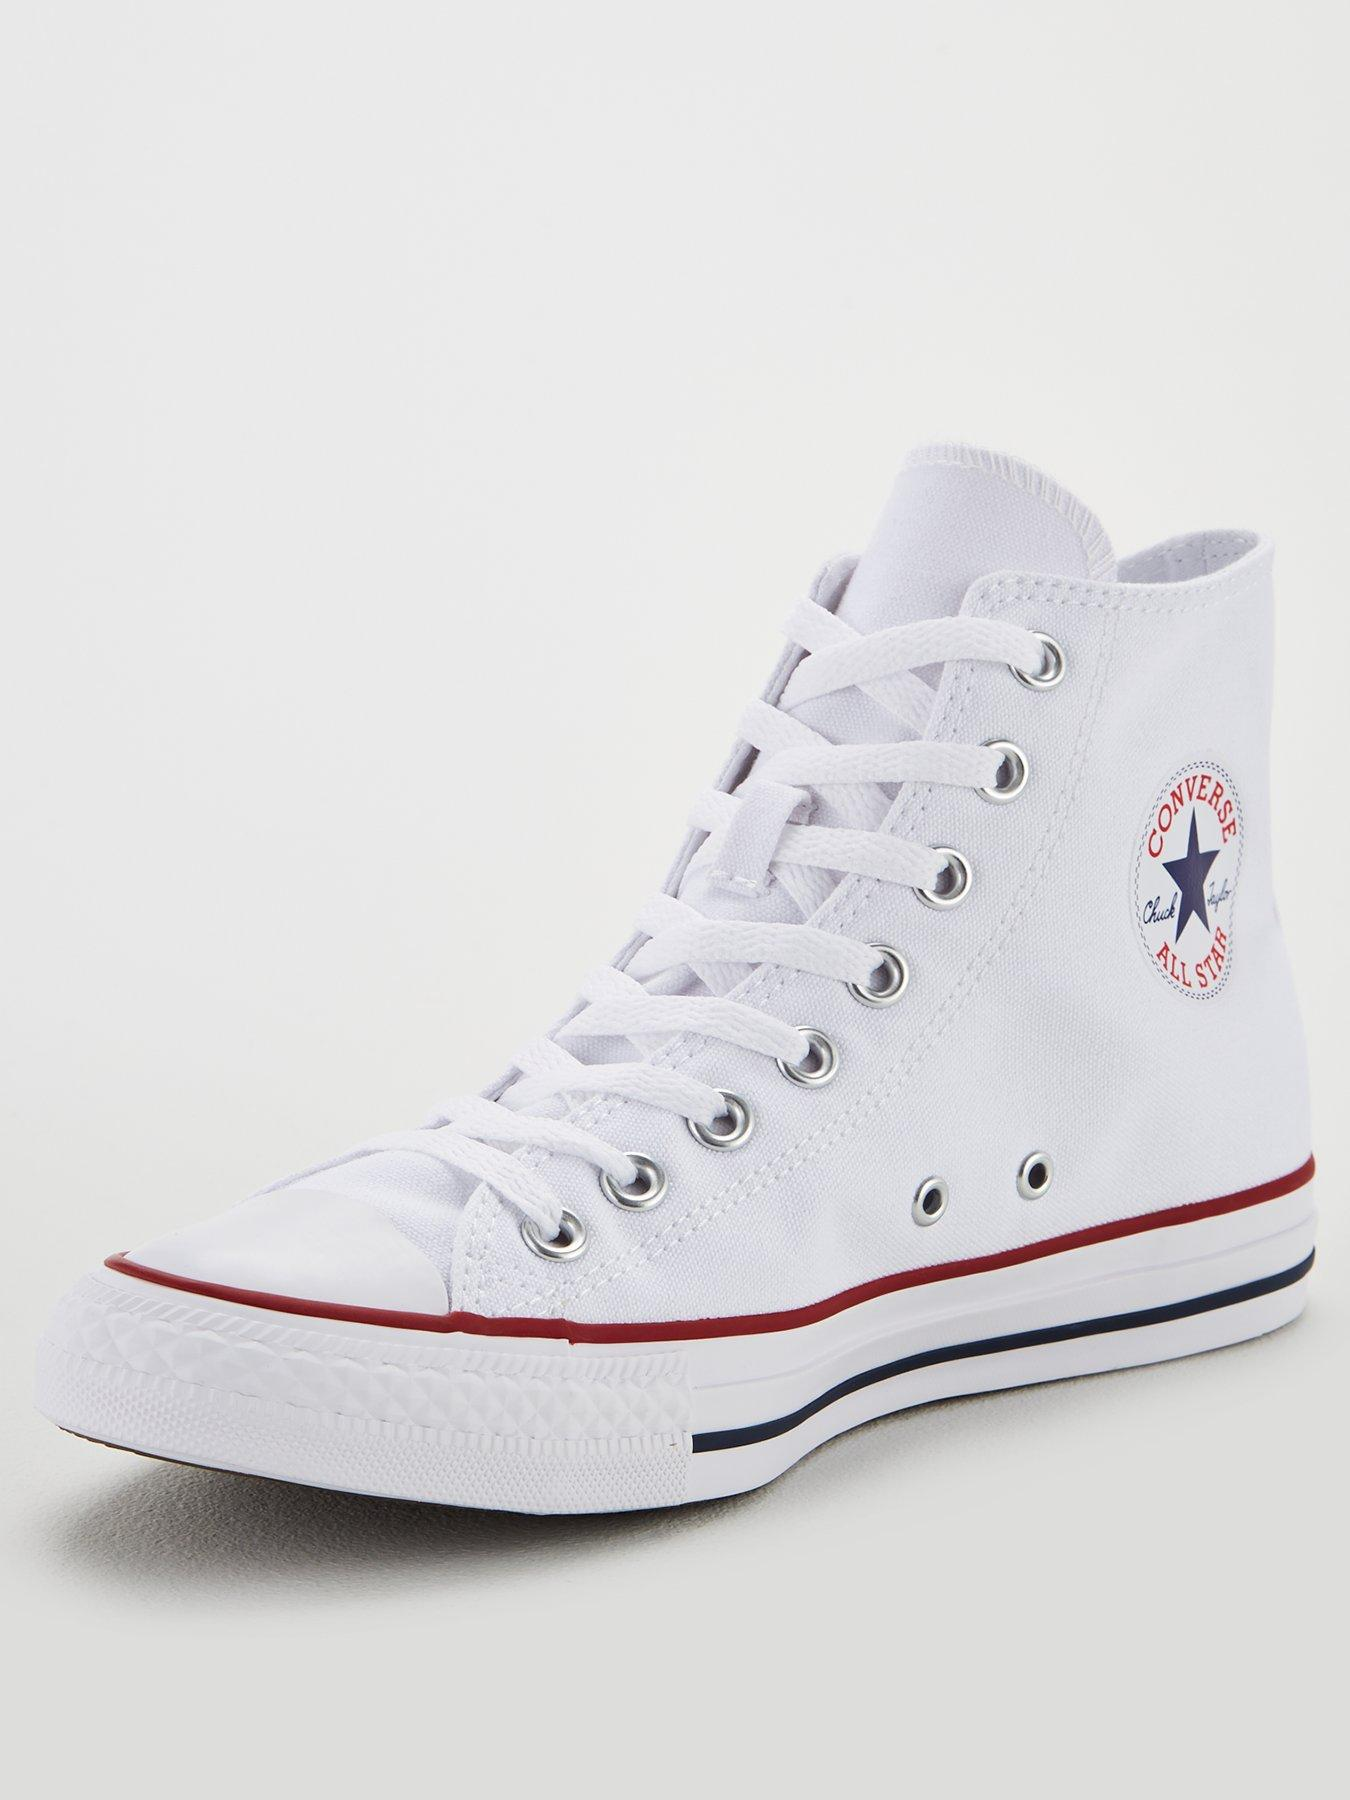 custom converse ireland